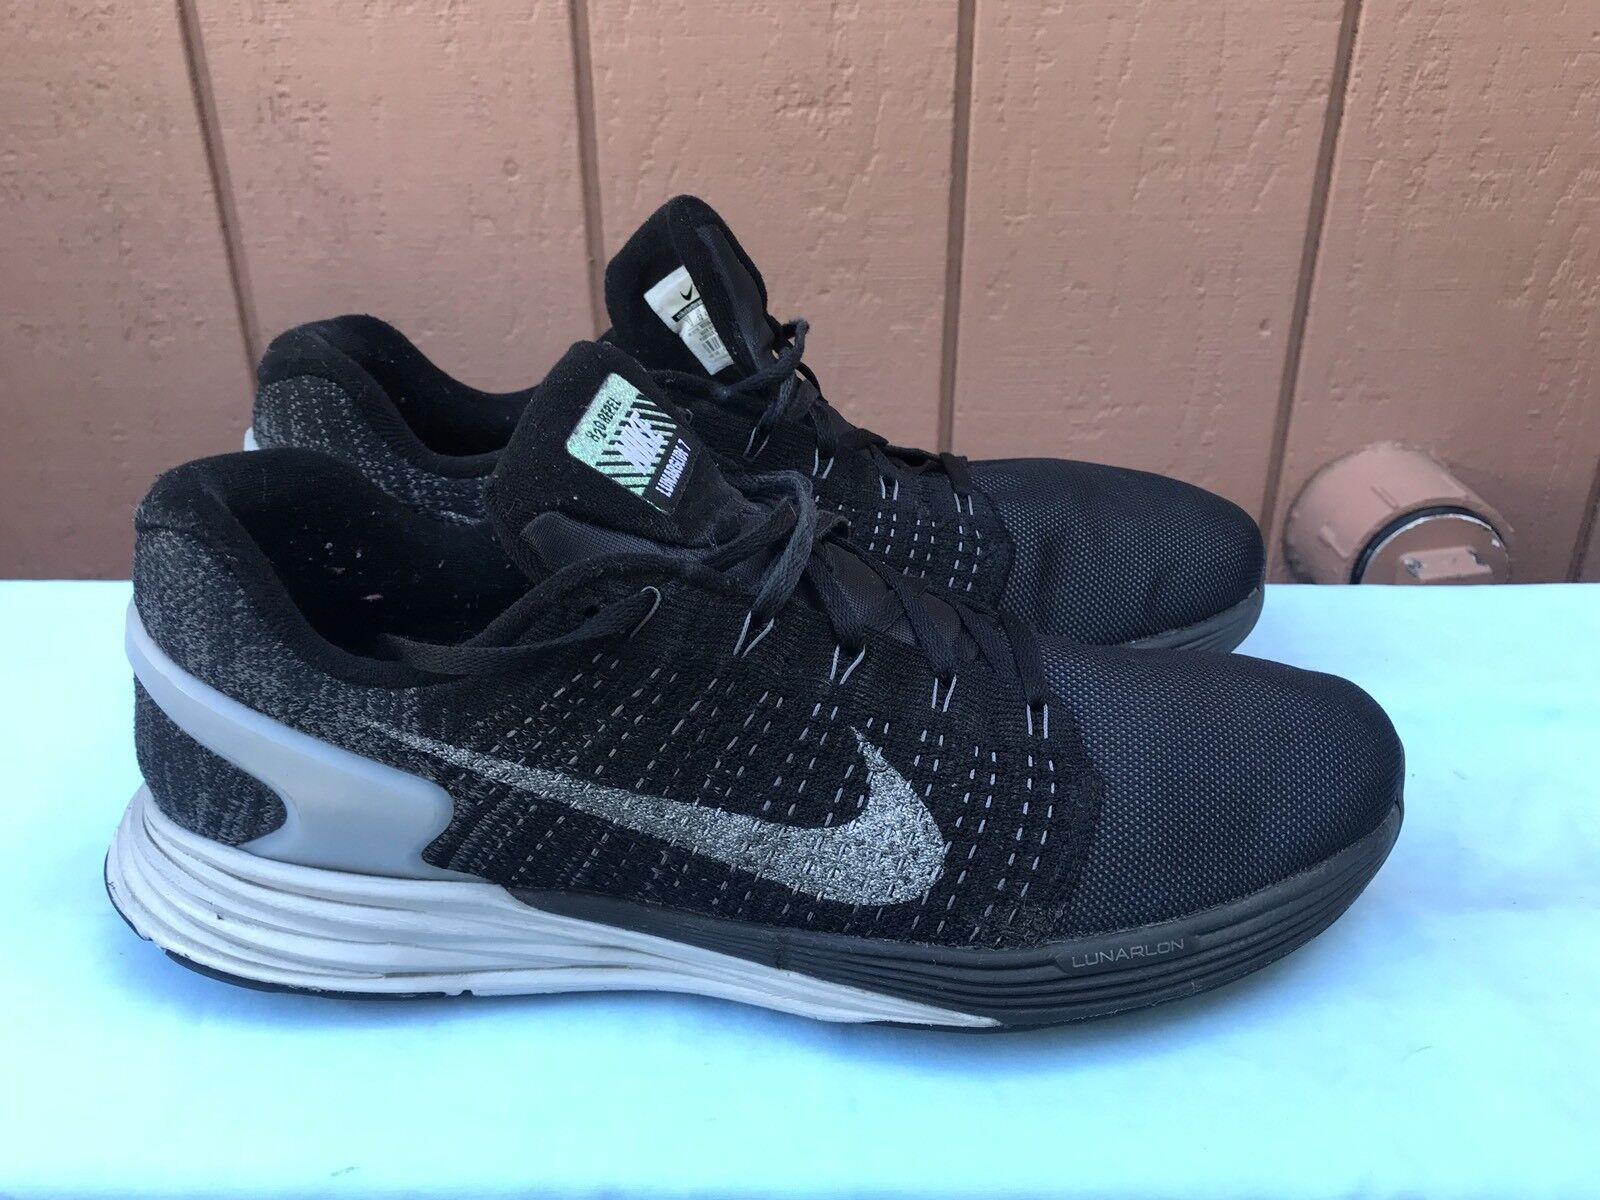 EUC Nike LUNARGIDE 7 FLASH BLACK 803566 001 Men's Size US 13 Running Shoes A6